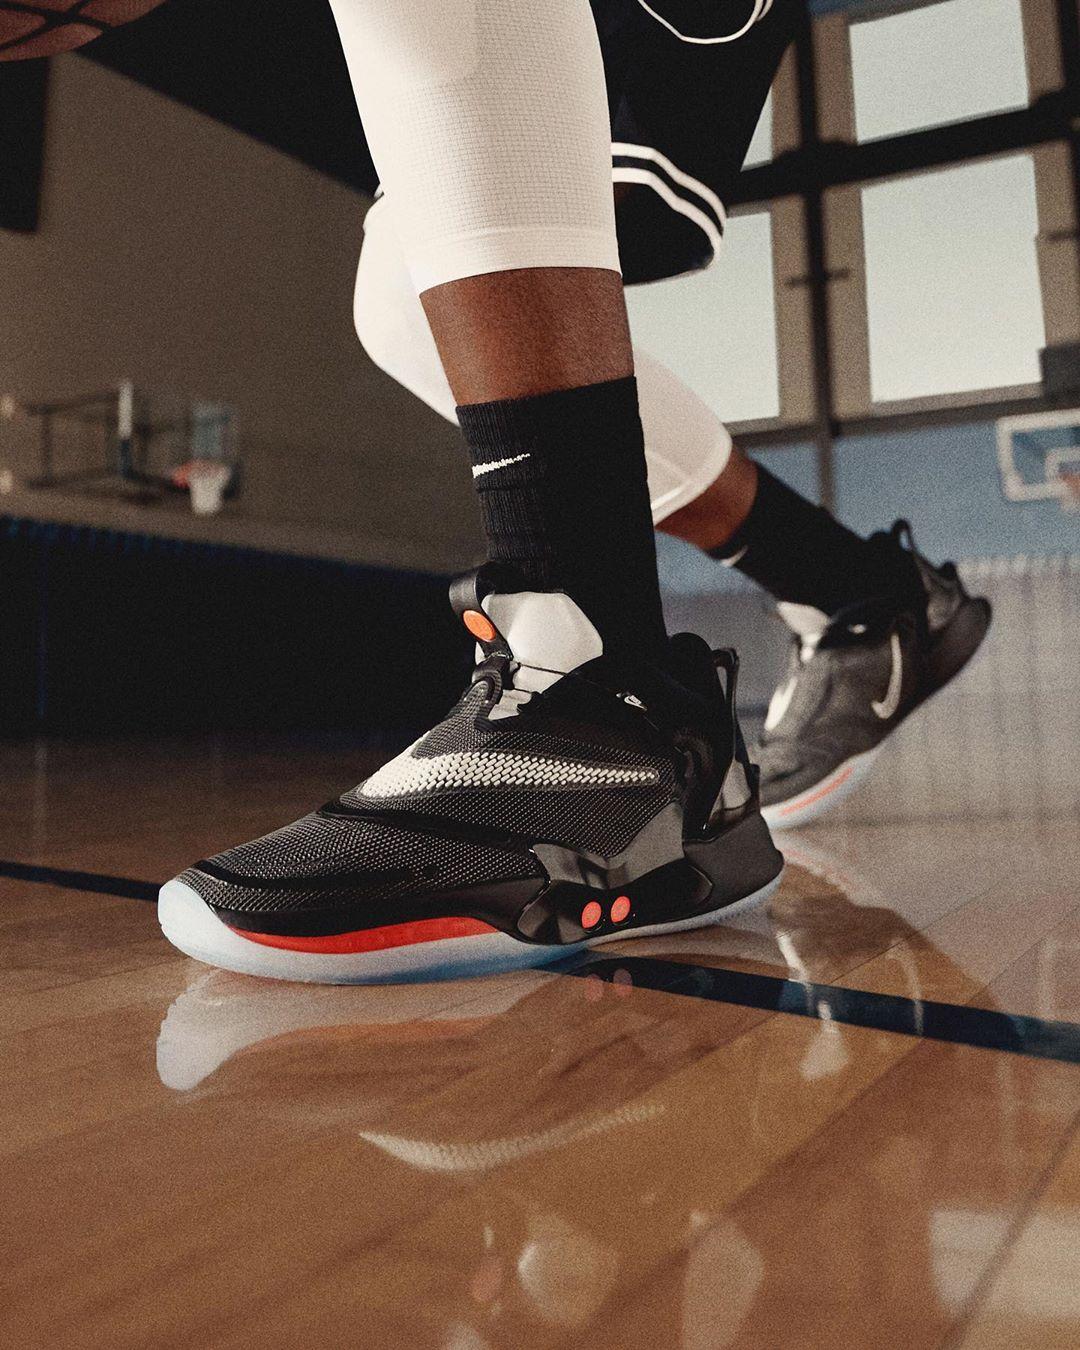 Nike,adapt BB,發售,2.0  市價破 3K!自動系帶 Adapt BB 2.0 國區發售信息來了!